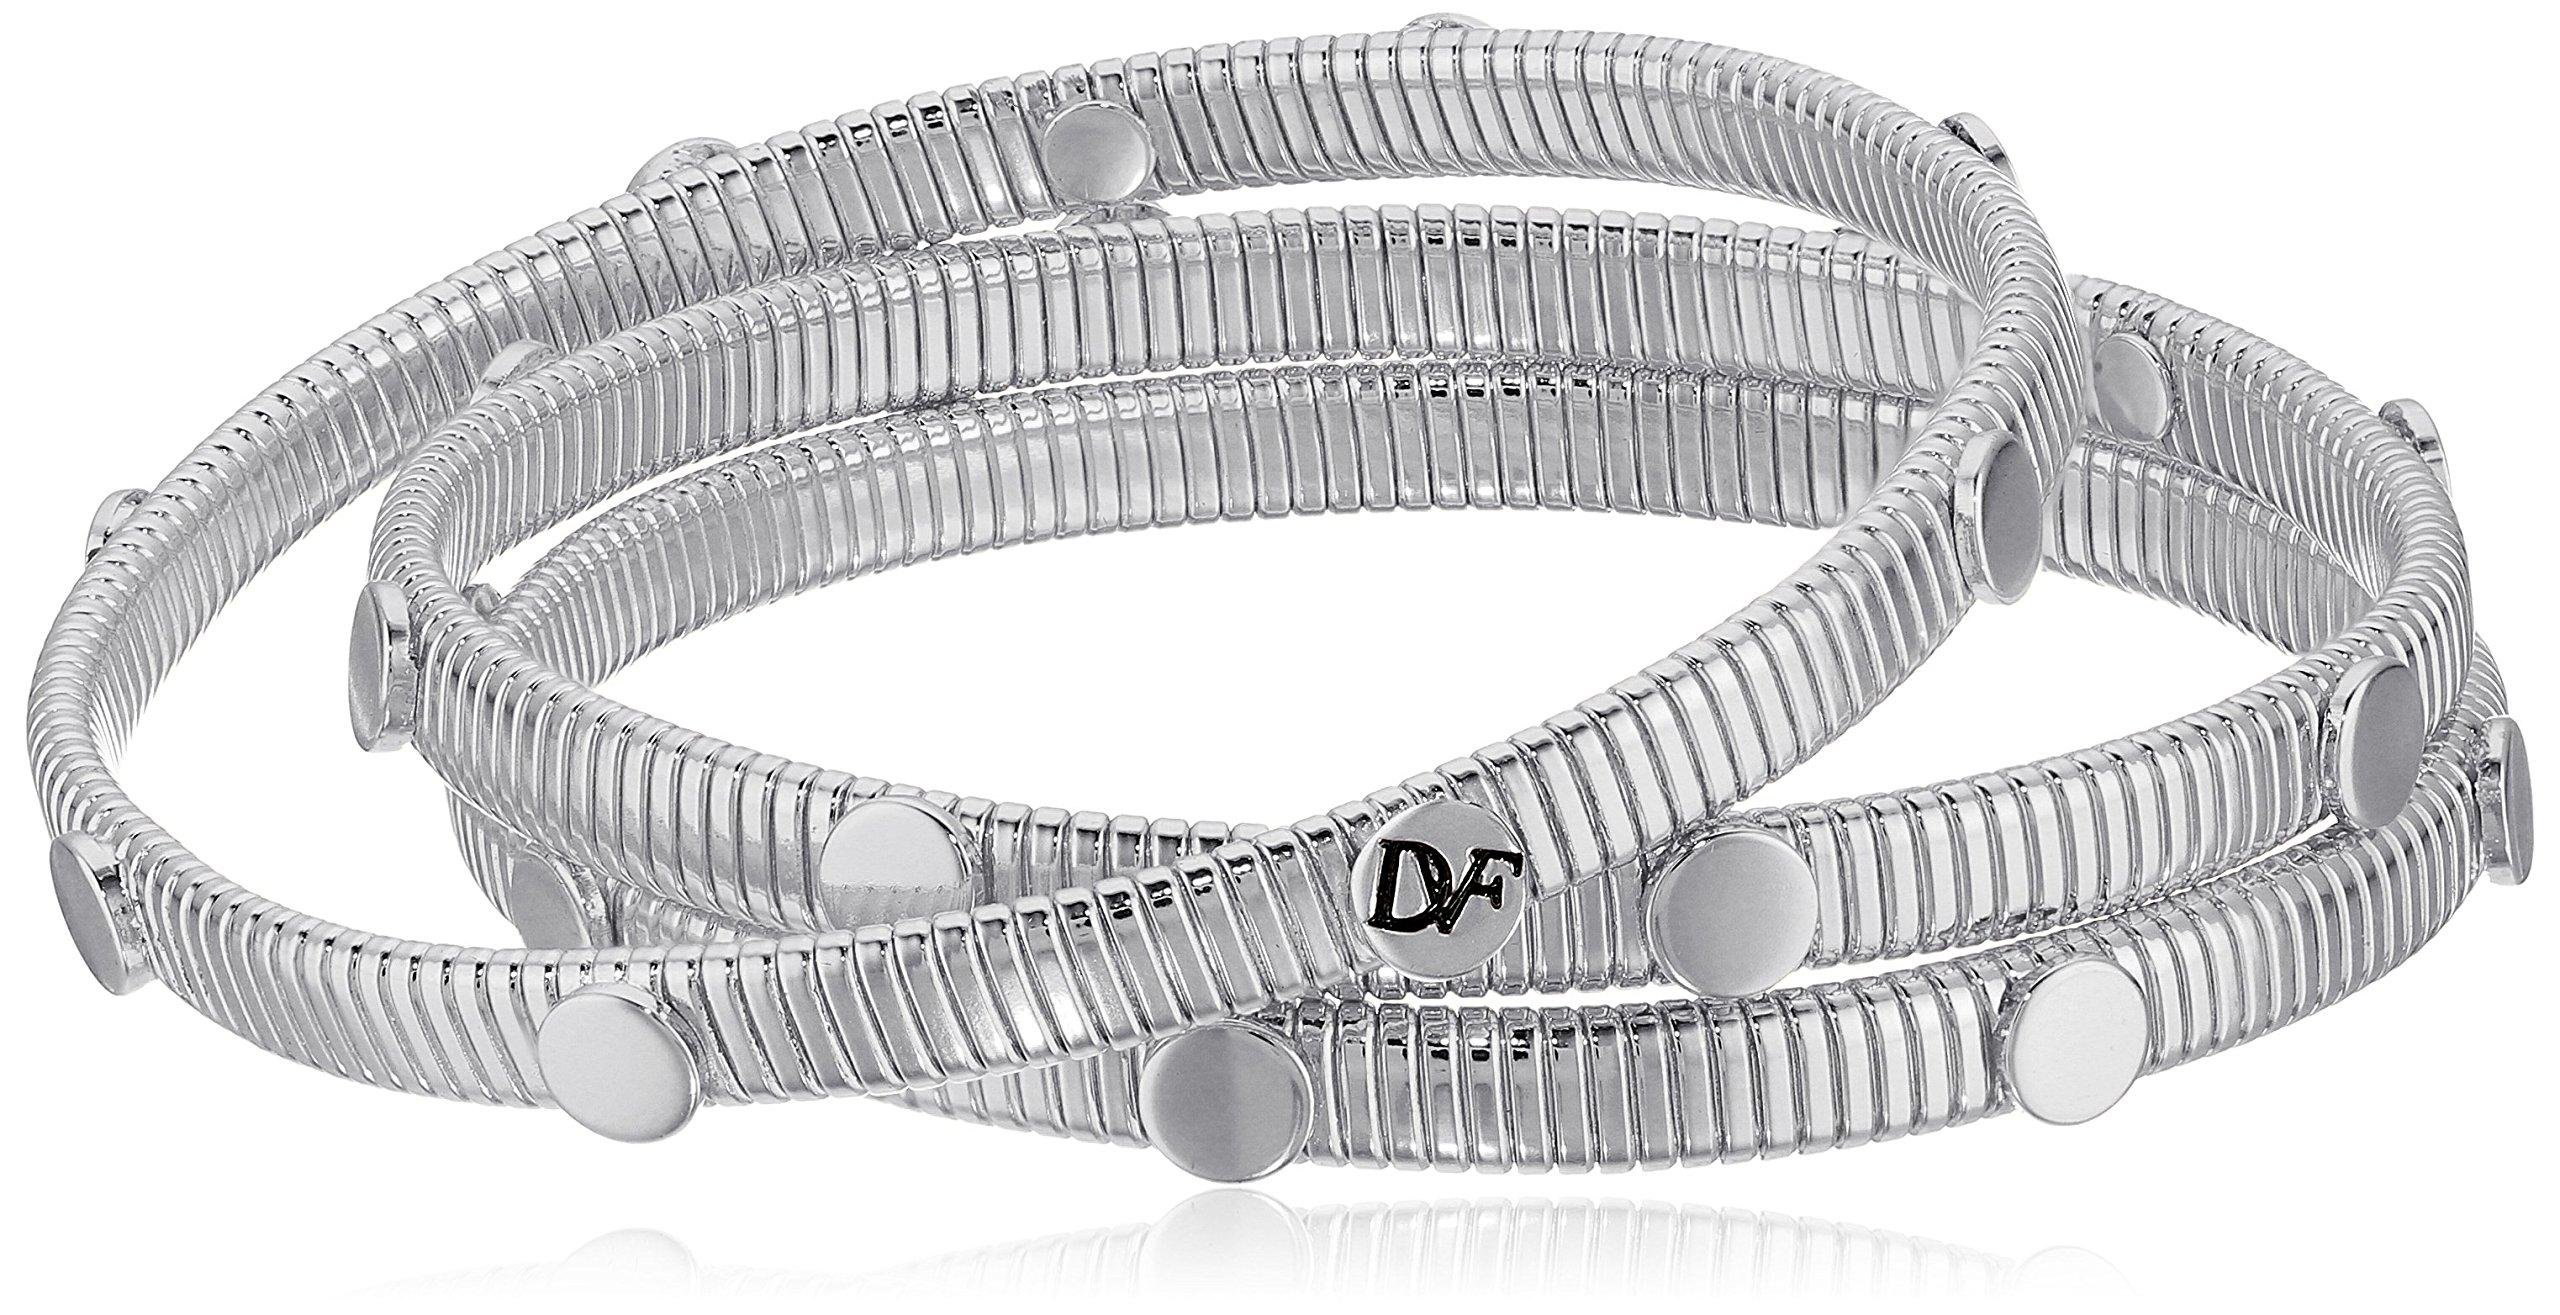 Diane von Furstenberg ''Summer Disco'' Circle Snake Chain Silver Bangle Bracelet